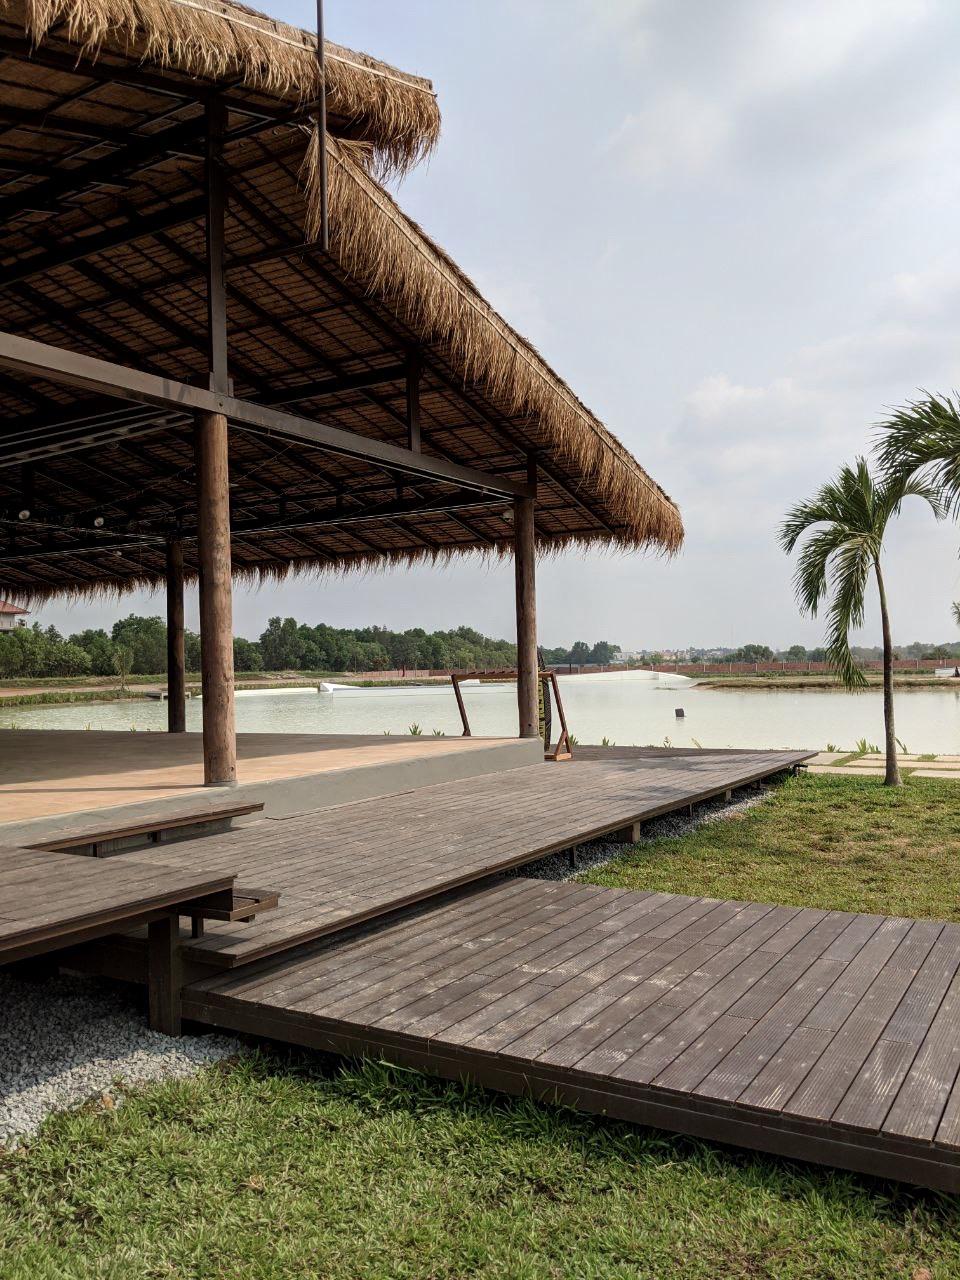 ICF WAKEPARK Cambodia